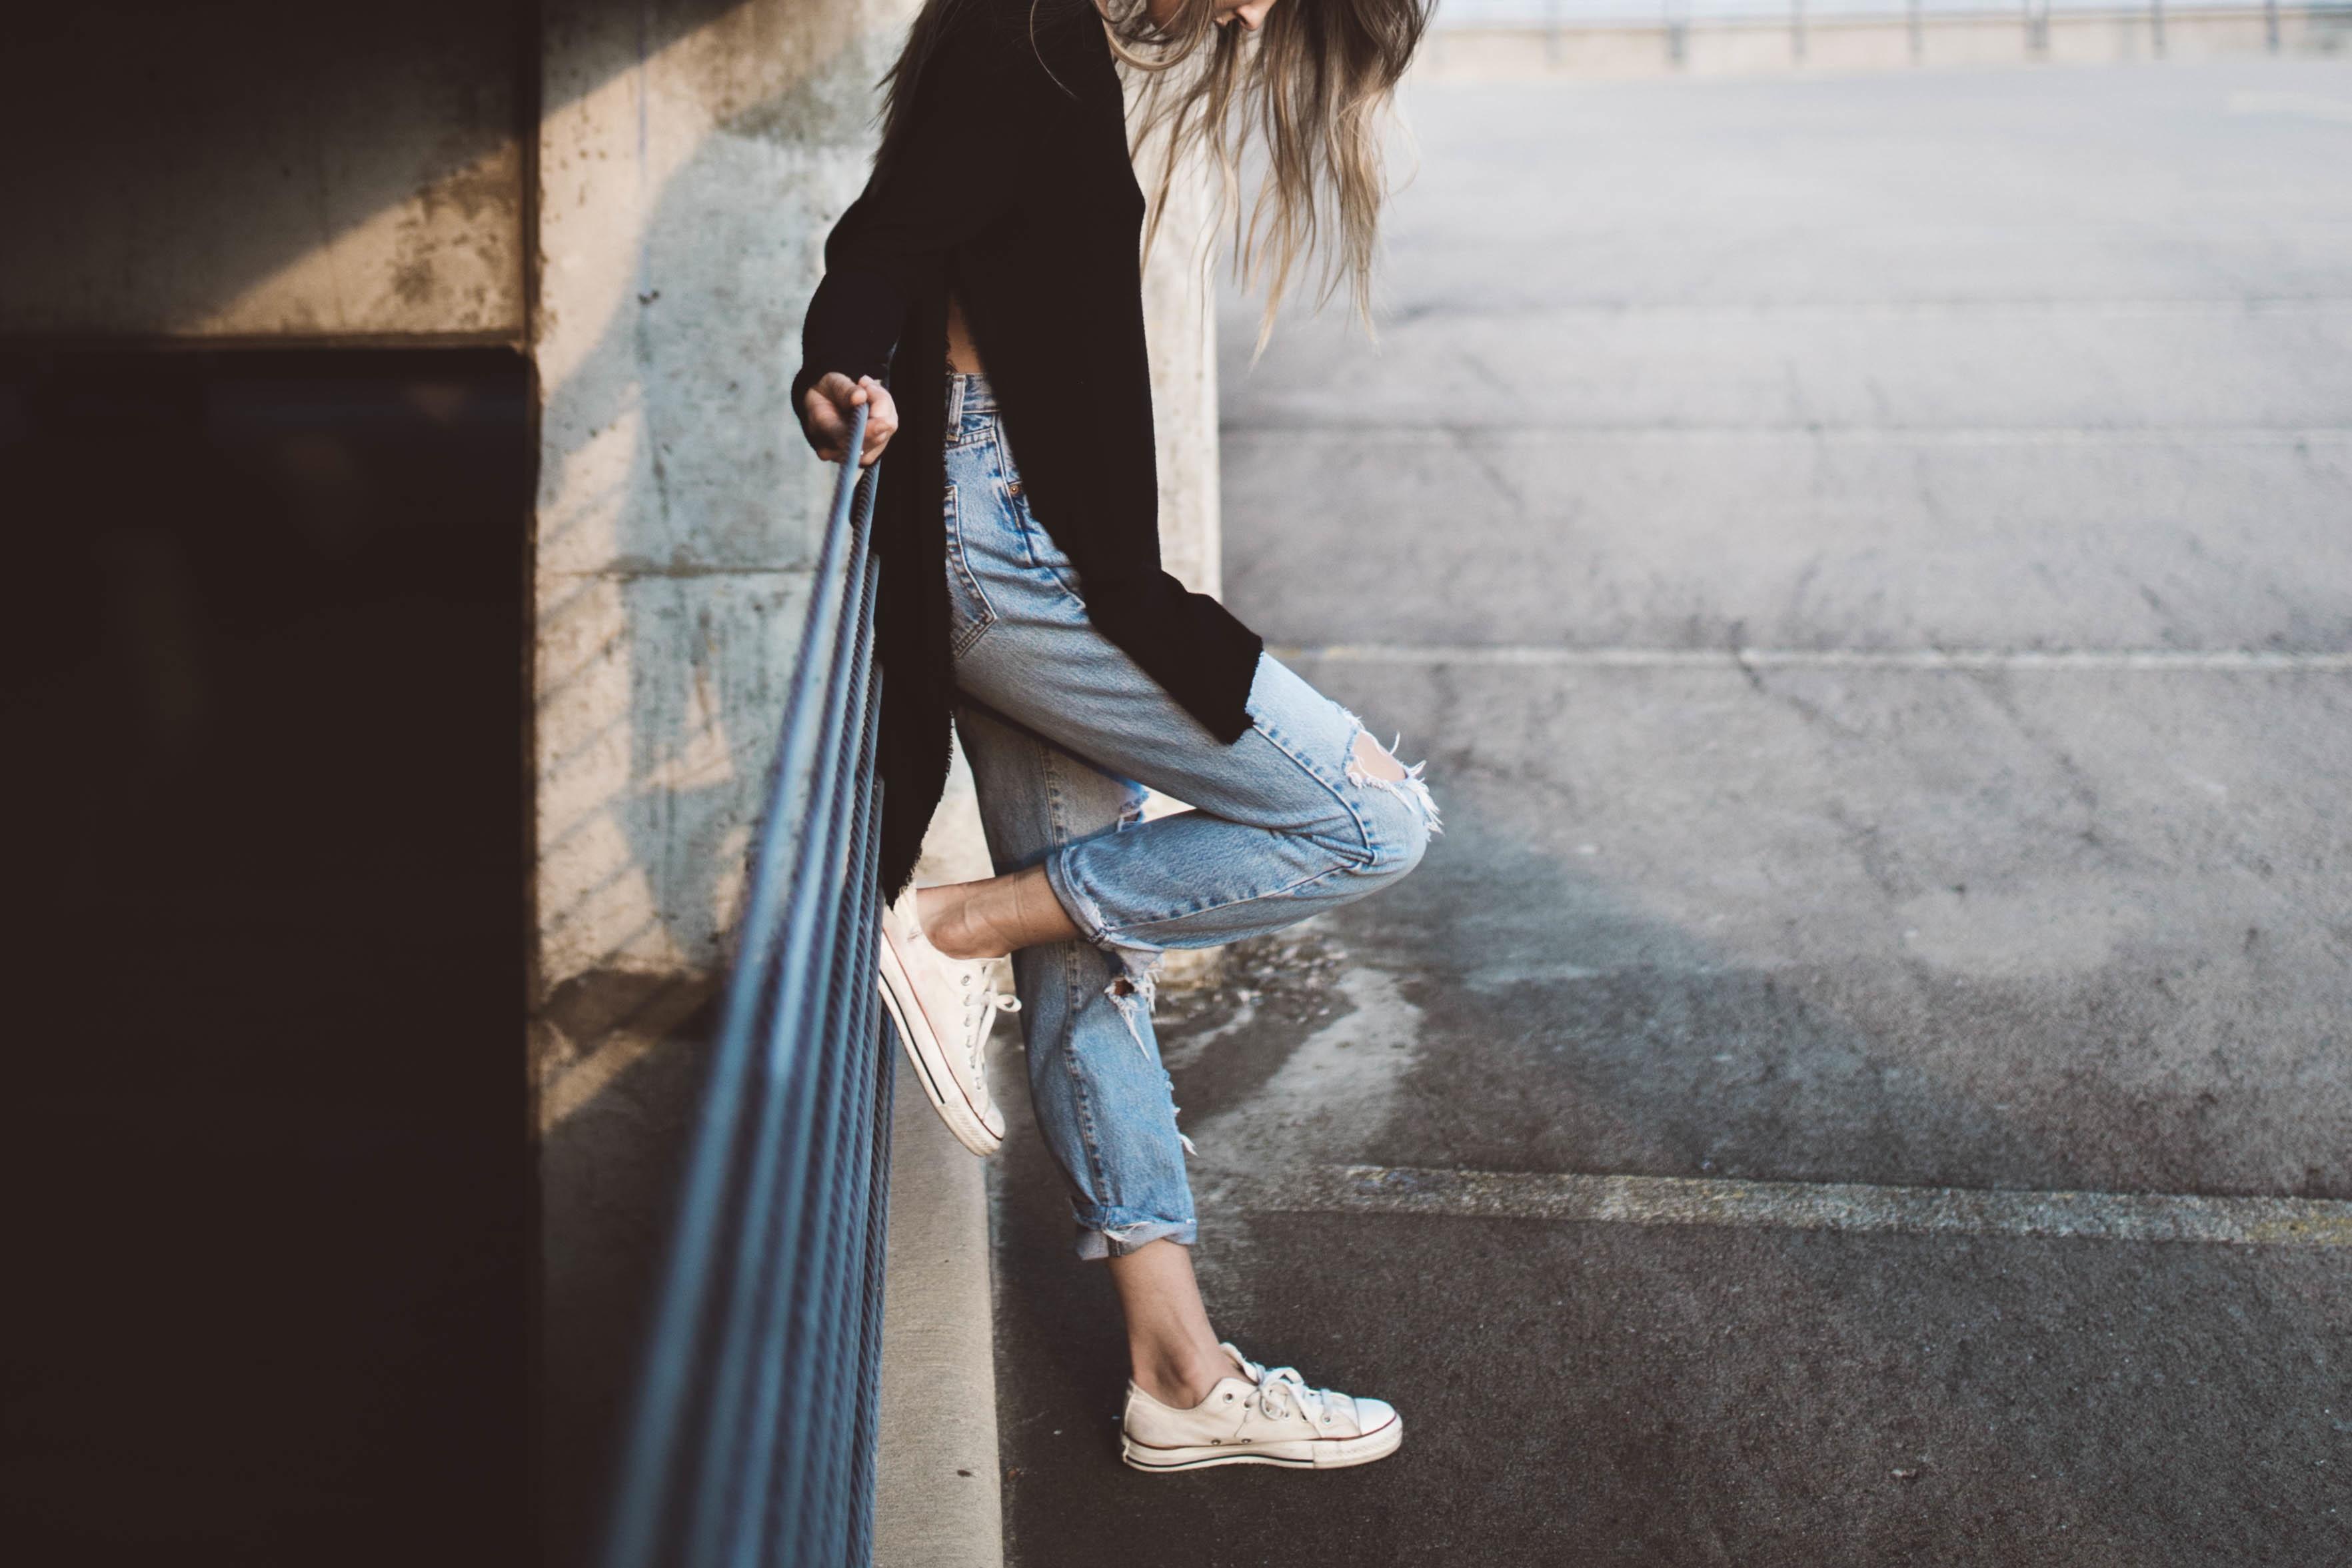 Free Images  shoe, girl, white, photography, urban